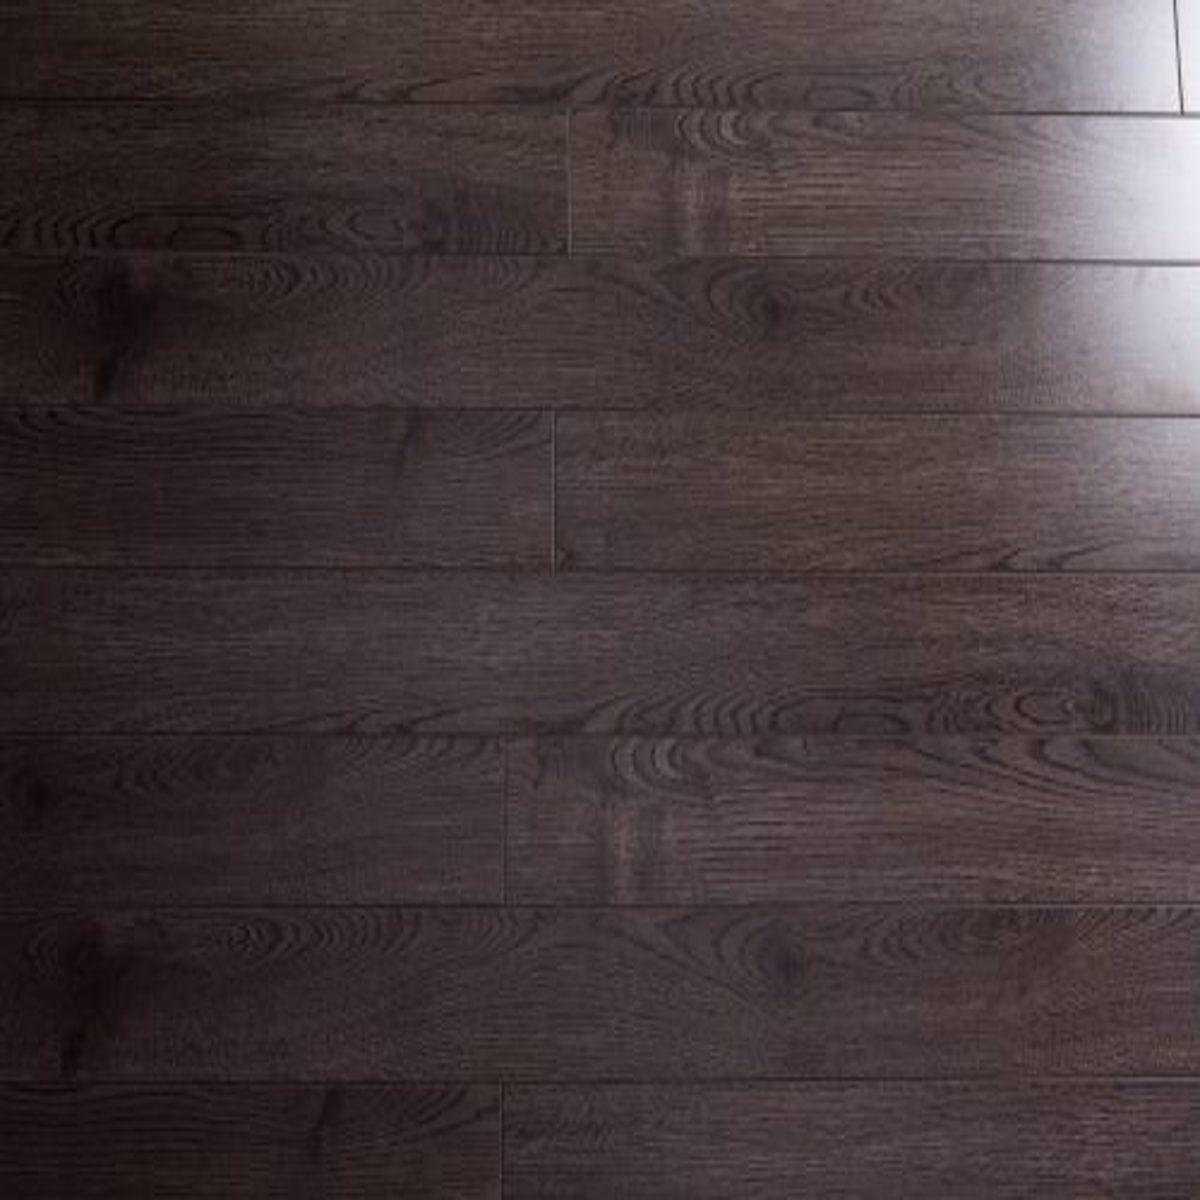 Mm Laminate Tf2308 15 3mm, 15mm Laminate Flooring Canada